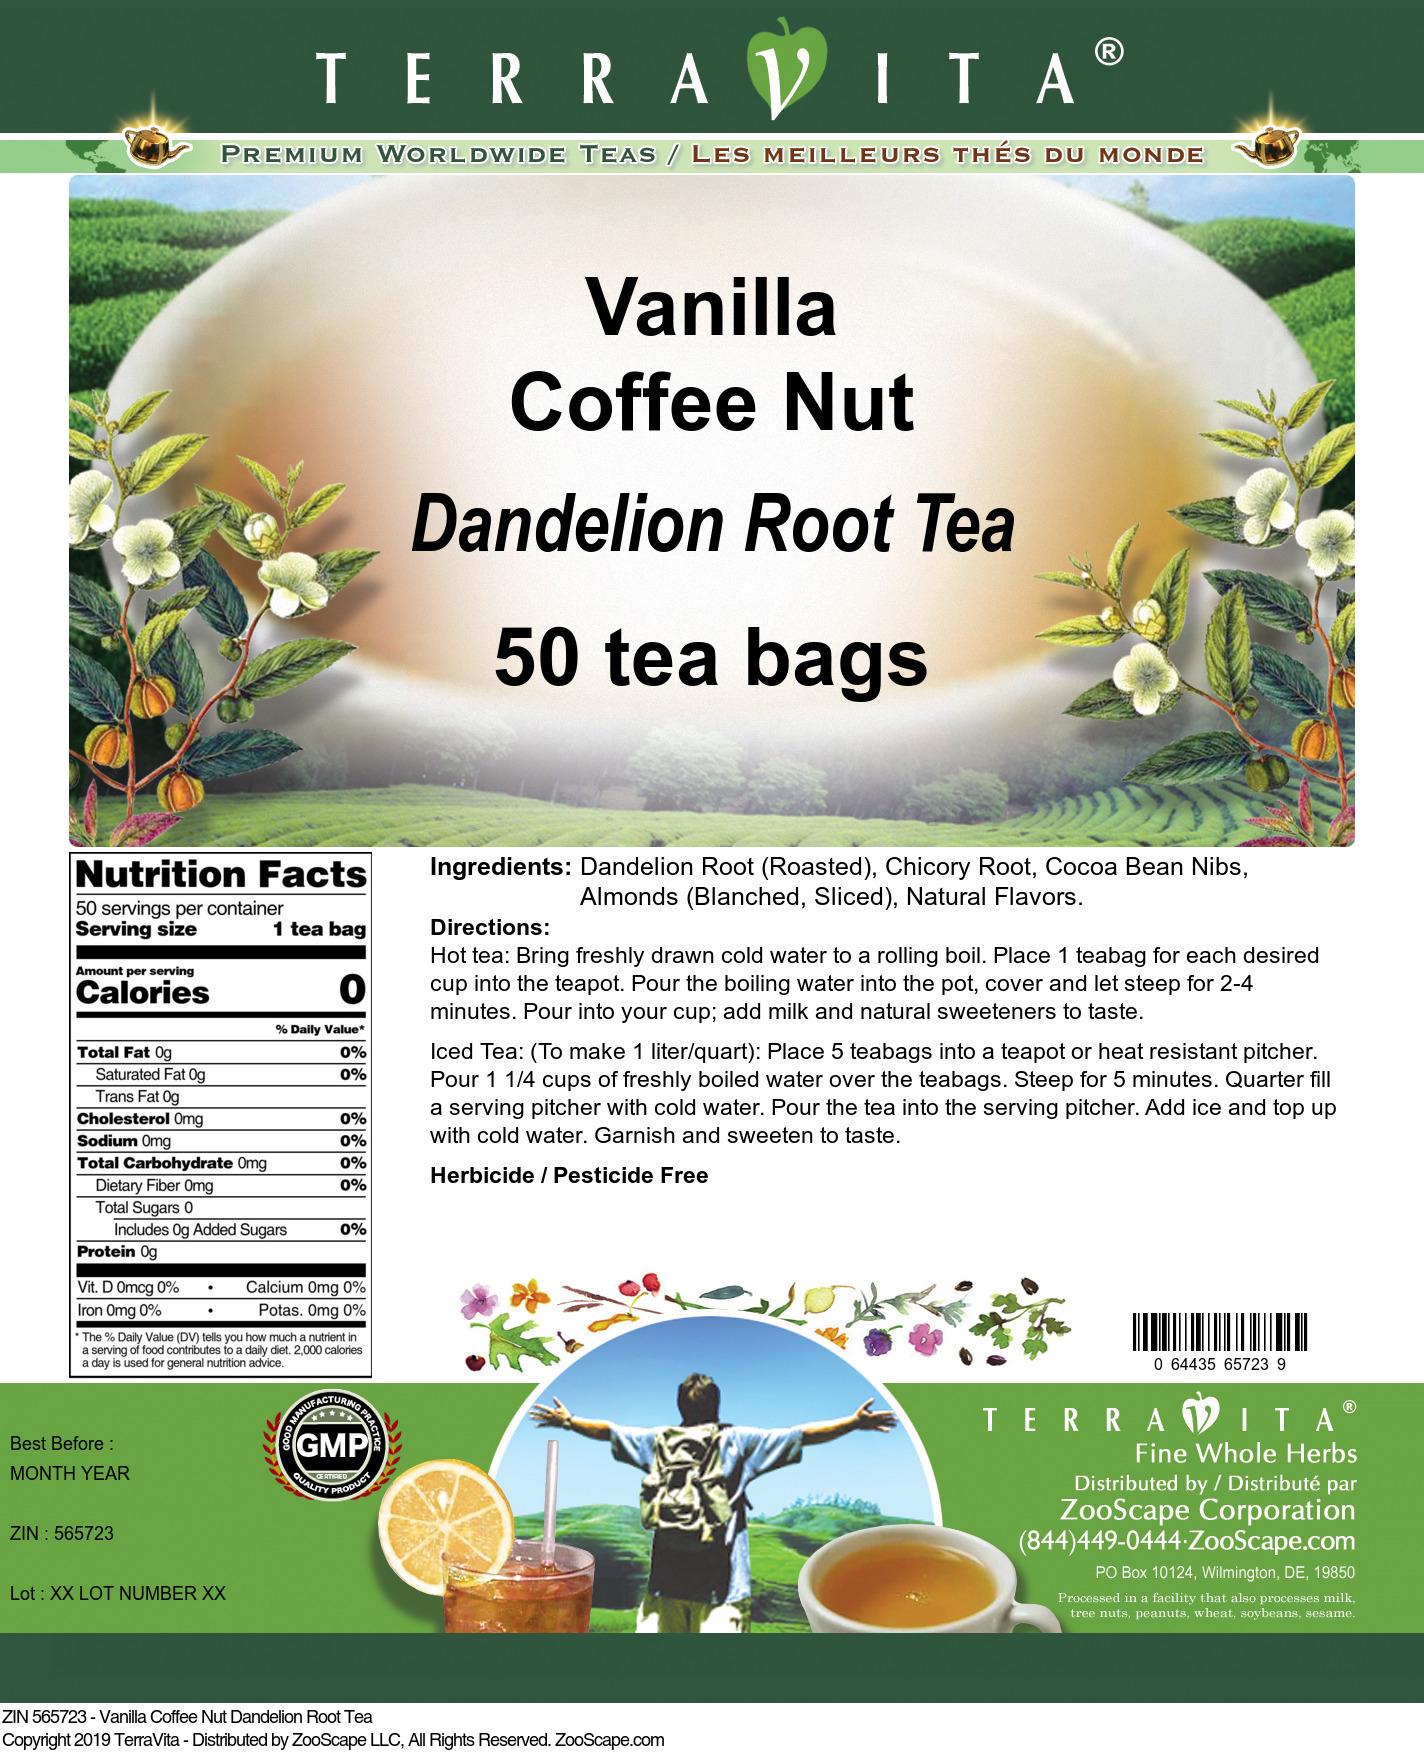 Vanilla Coffee Nut Dandelion Root Tea